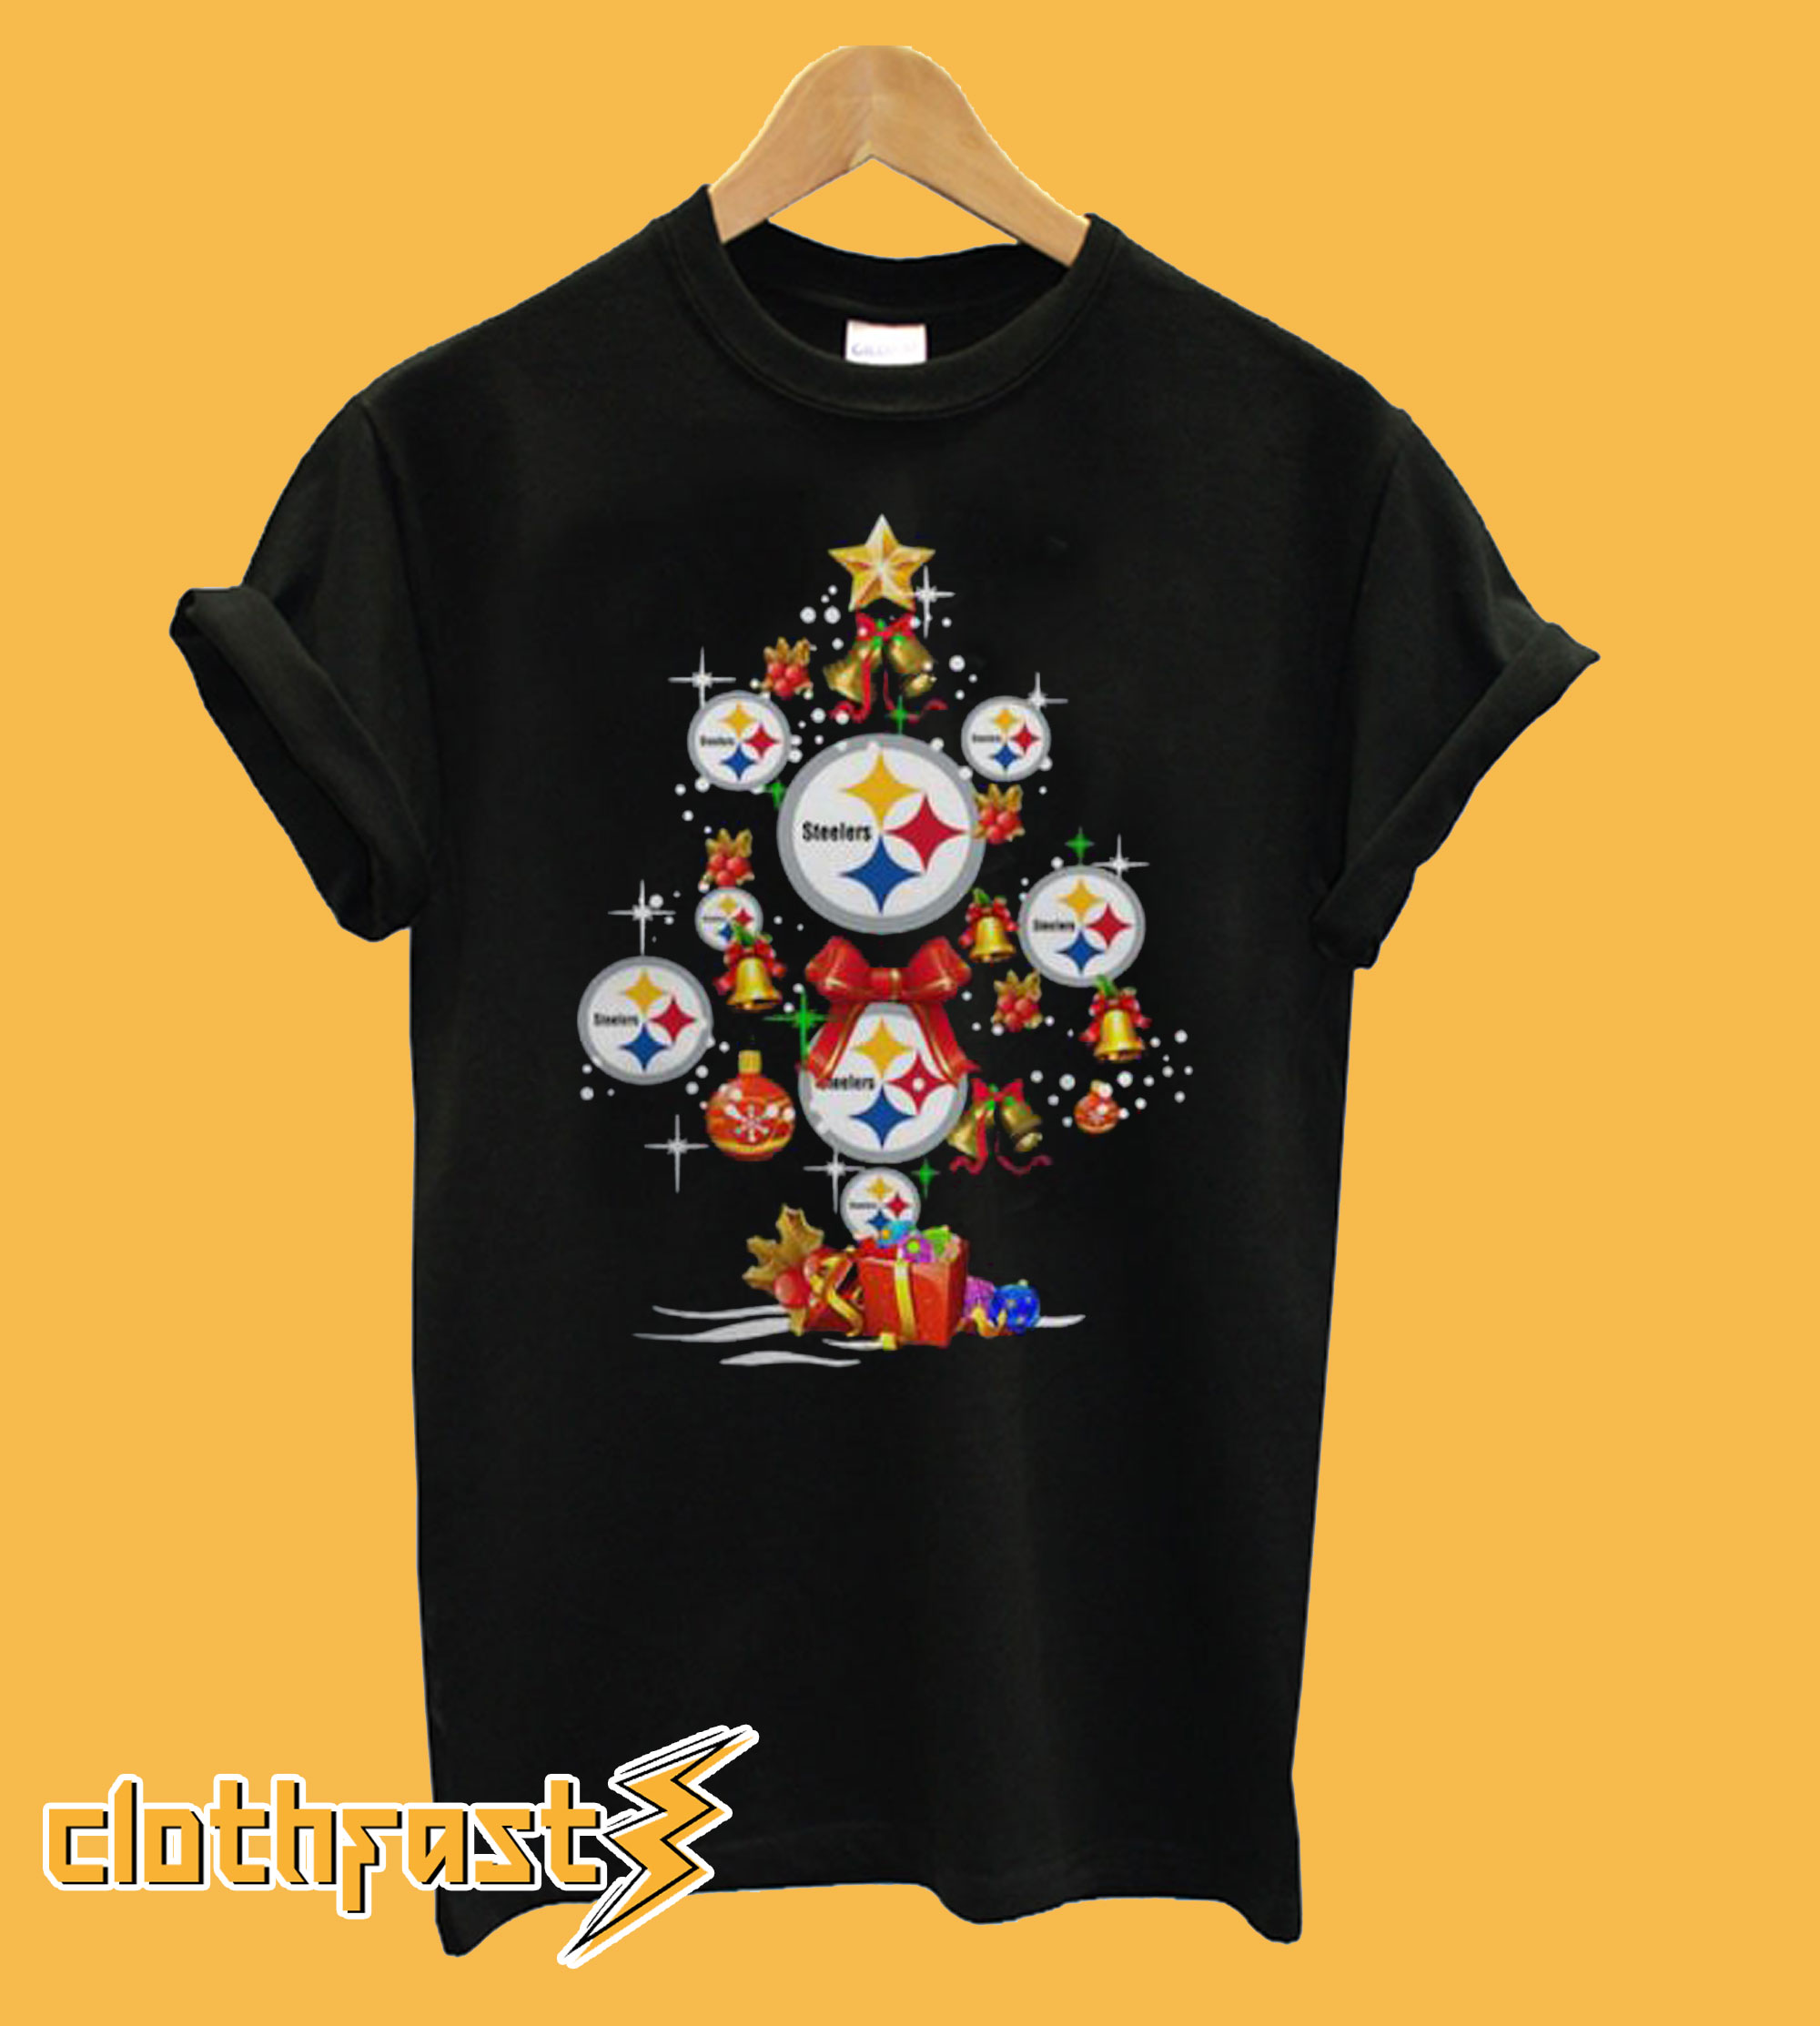 Pittsburgh Steelers Merry Christmas Tree T-shirt Unisex Tshirt